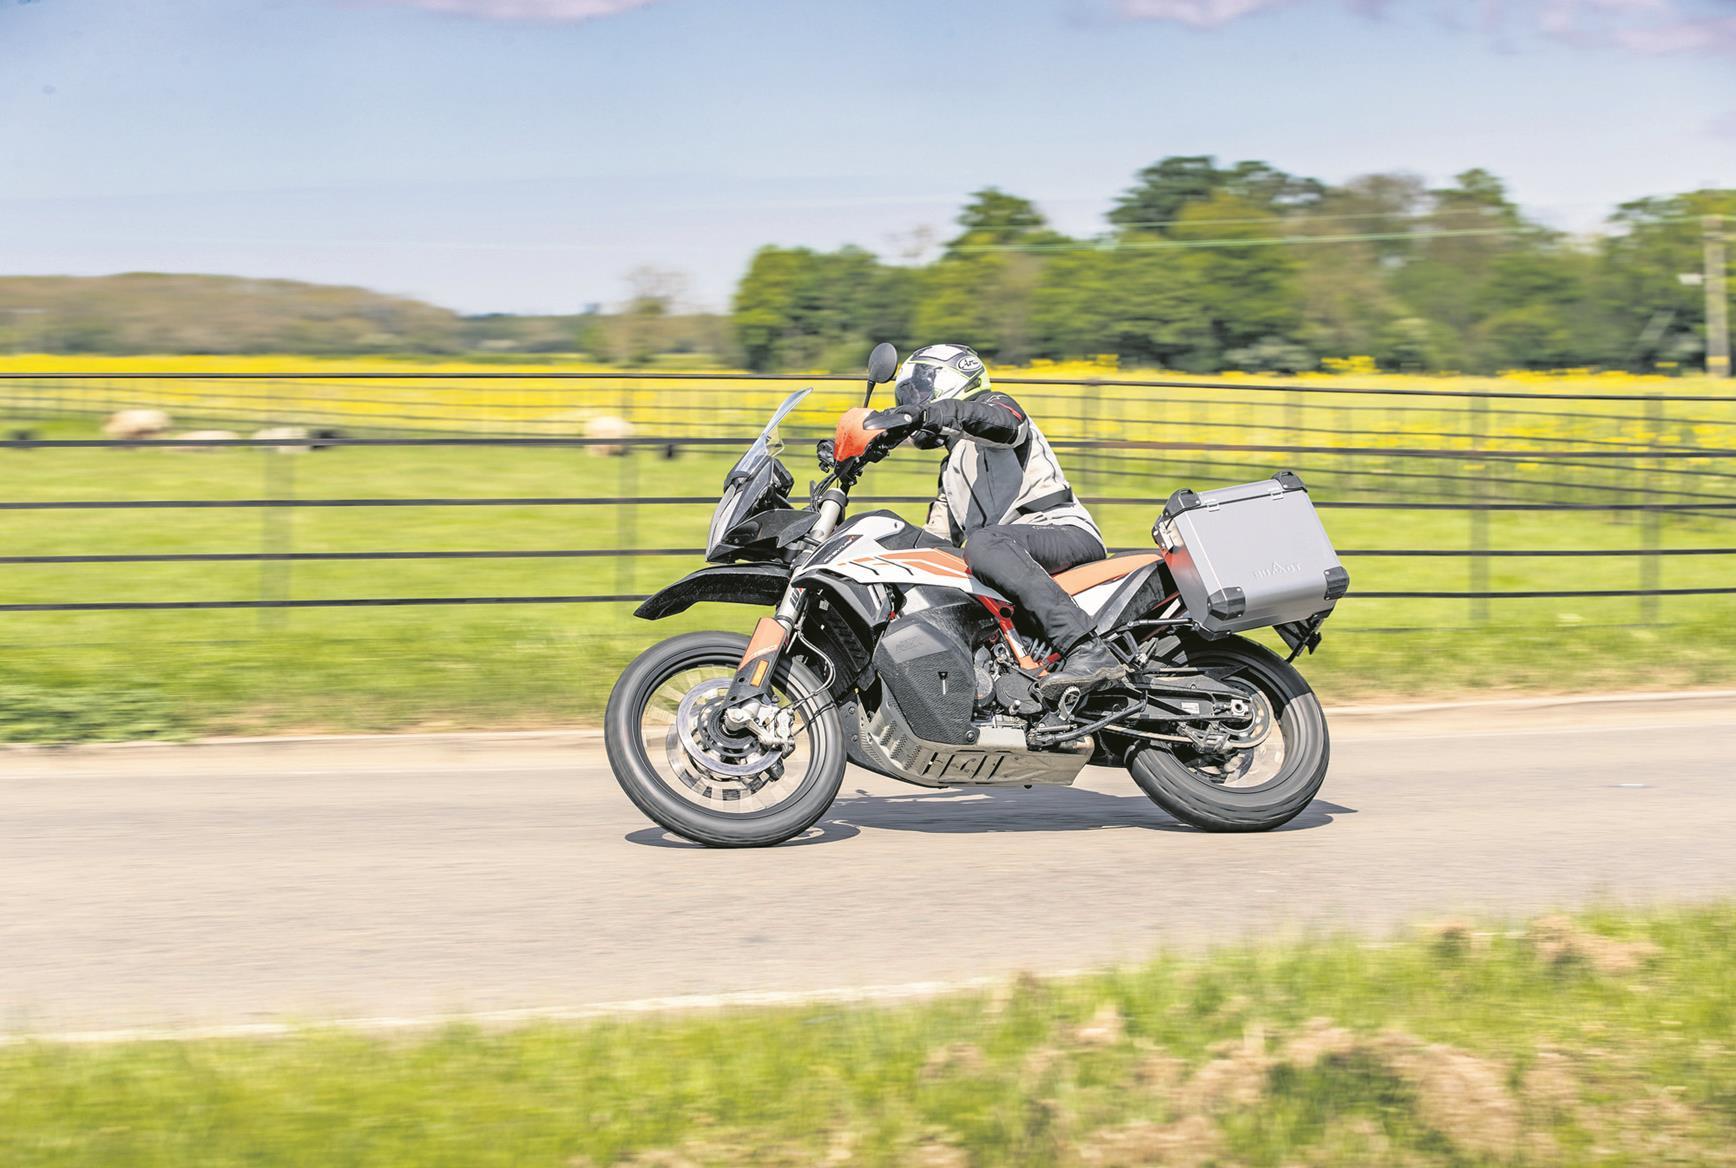 Riding the KTM 790 Adventure R